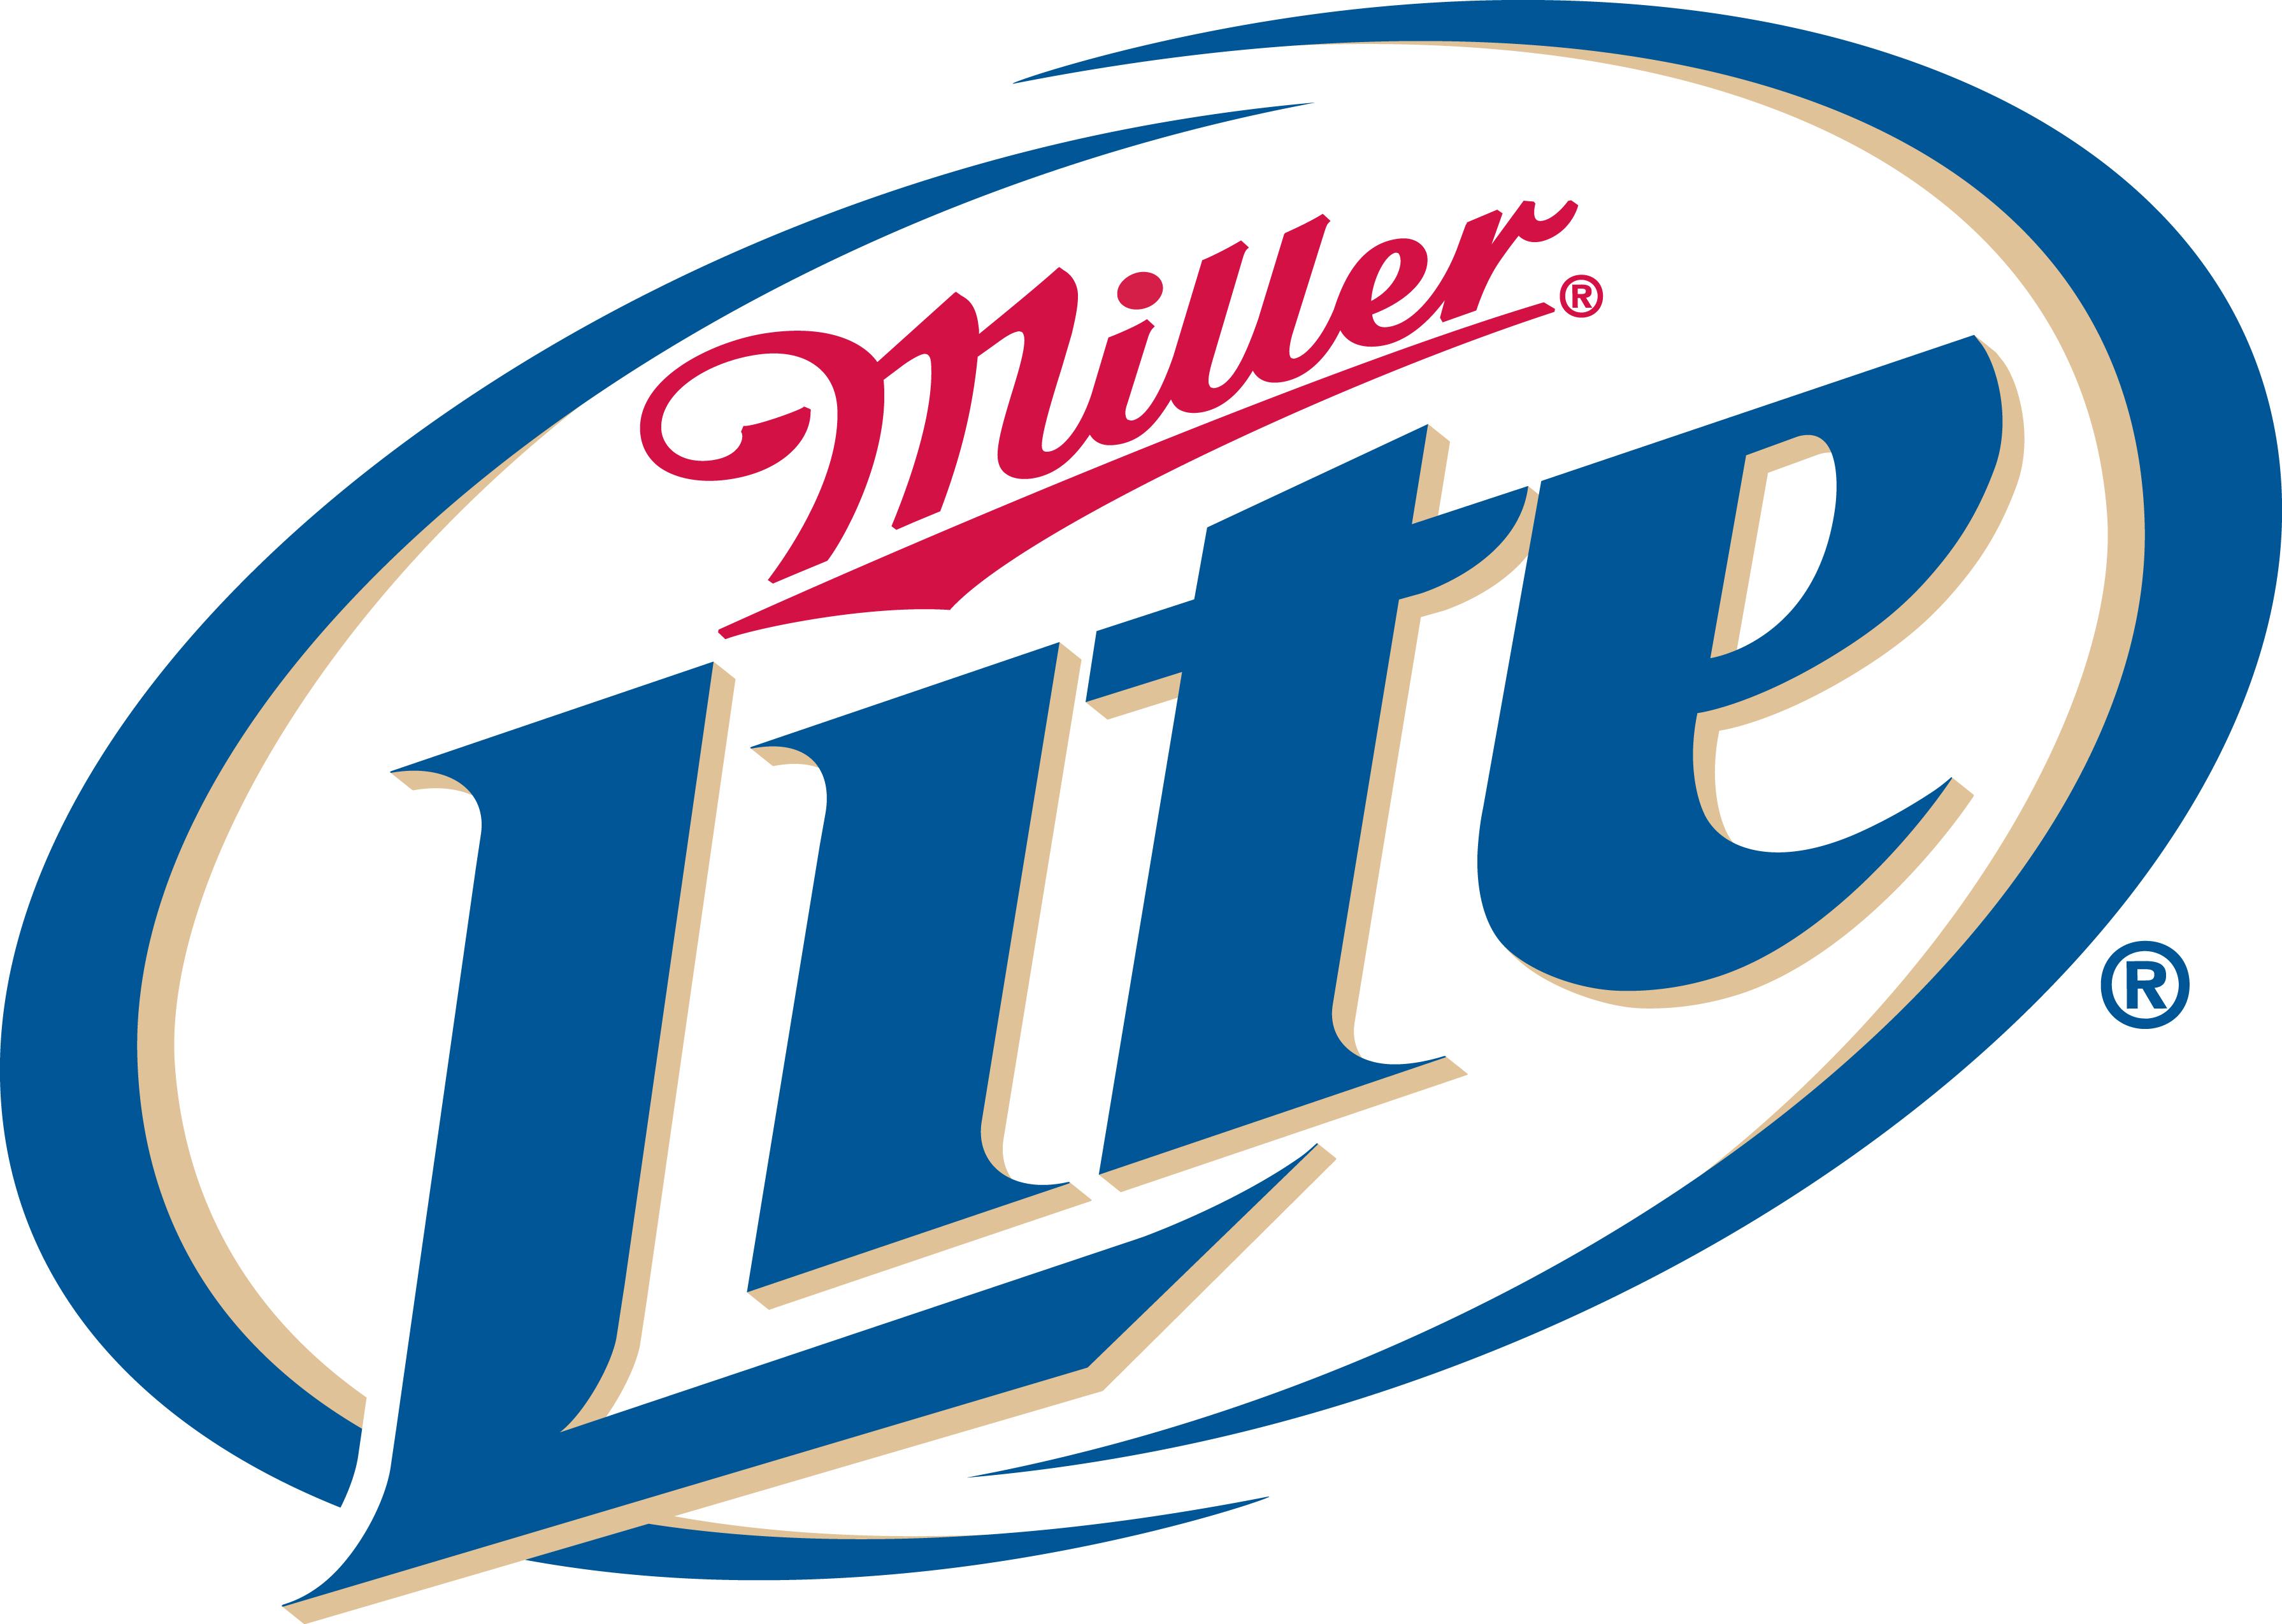 Miller light Logos